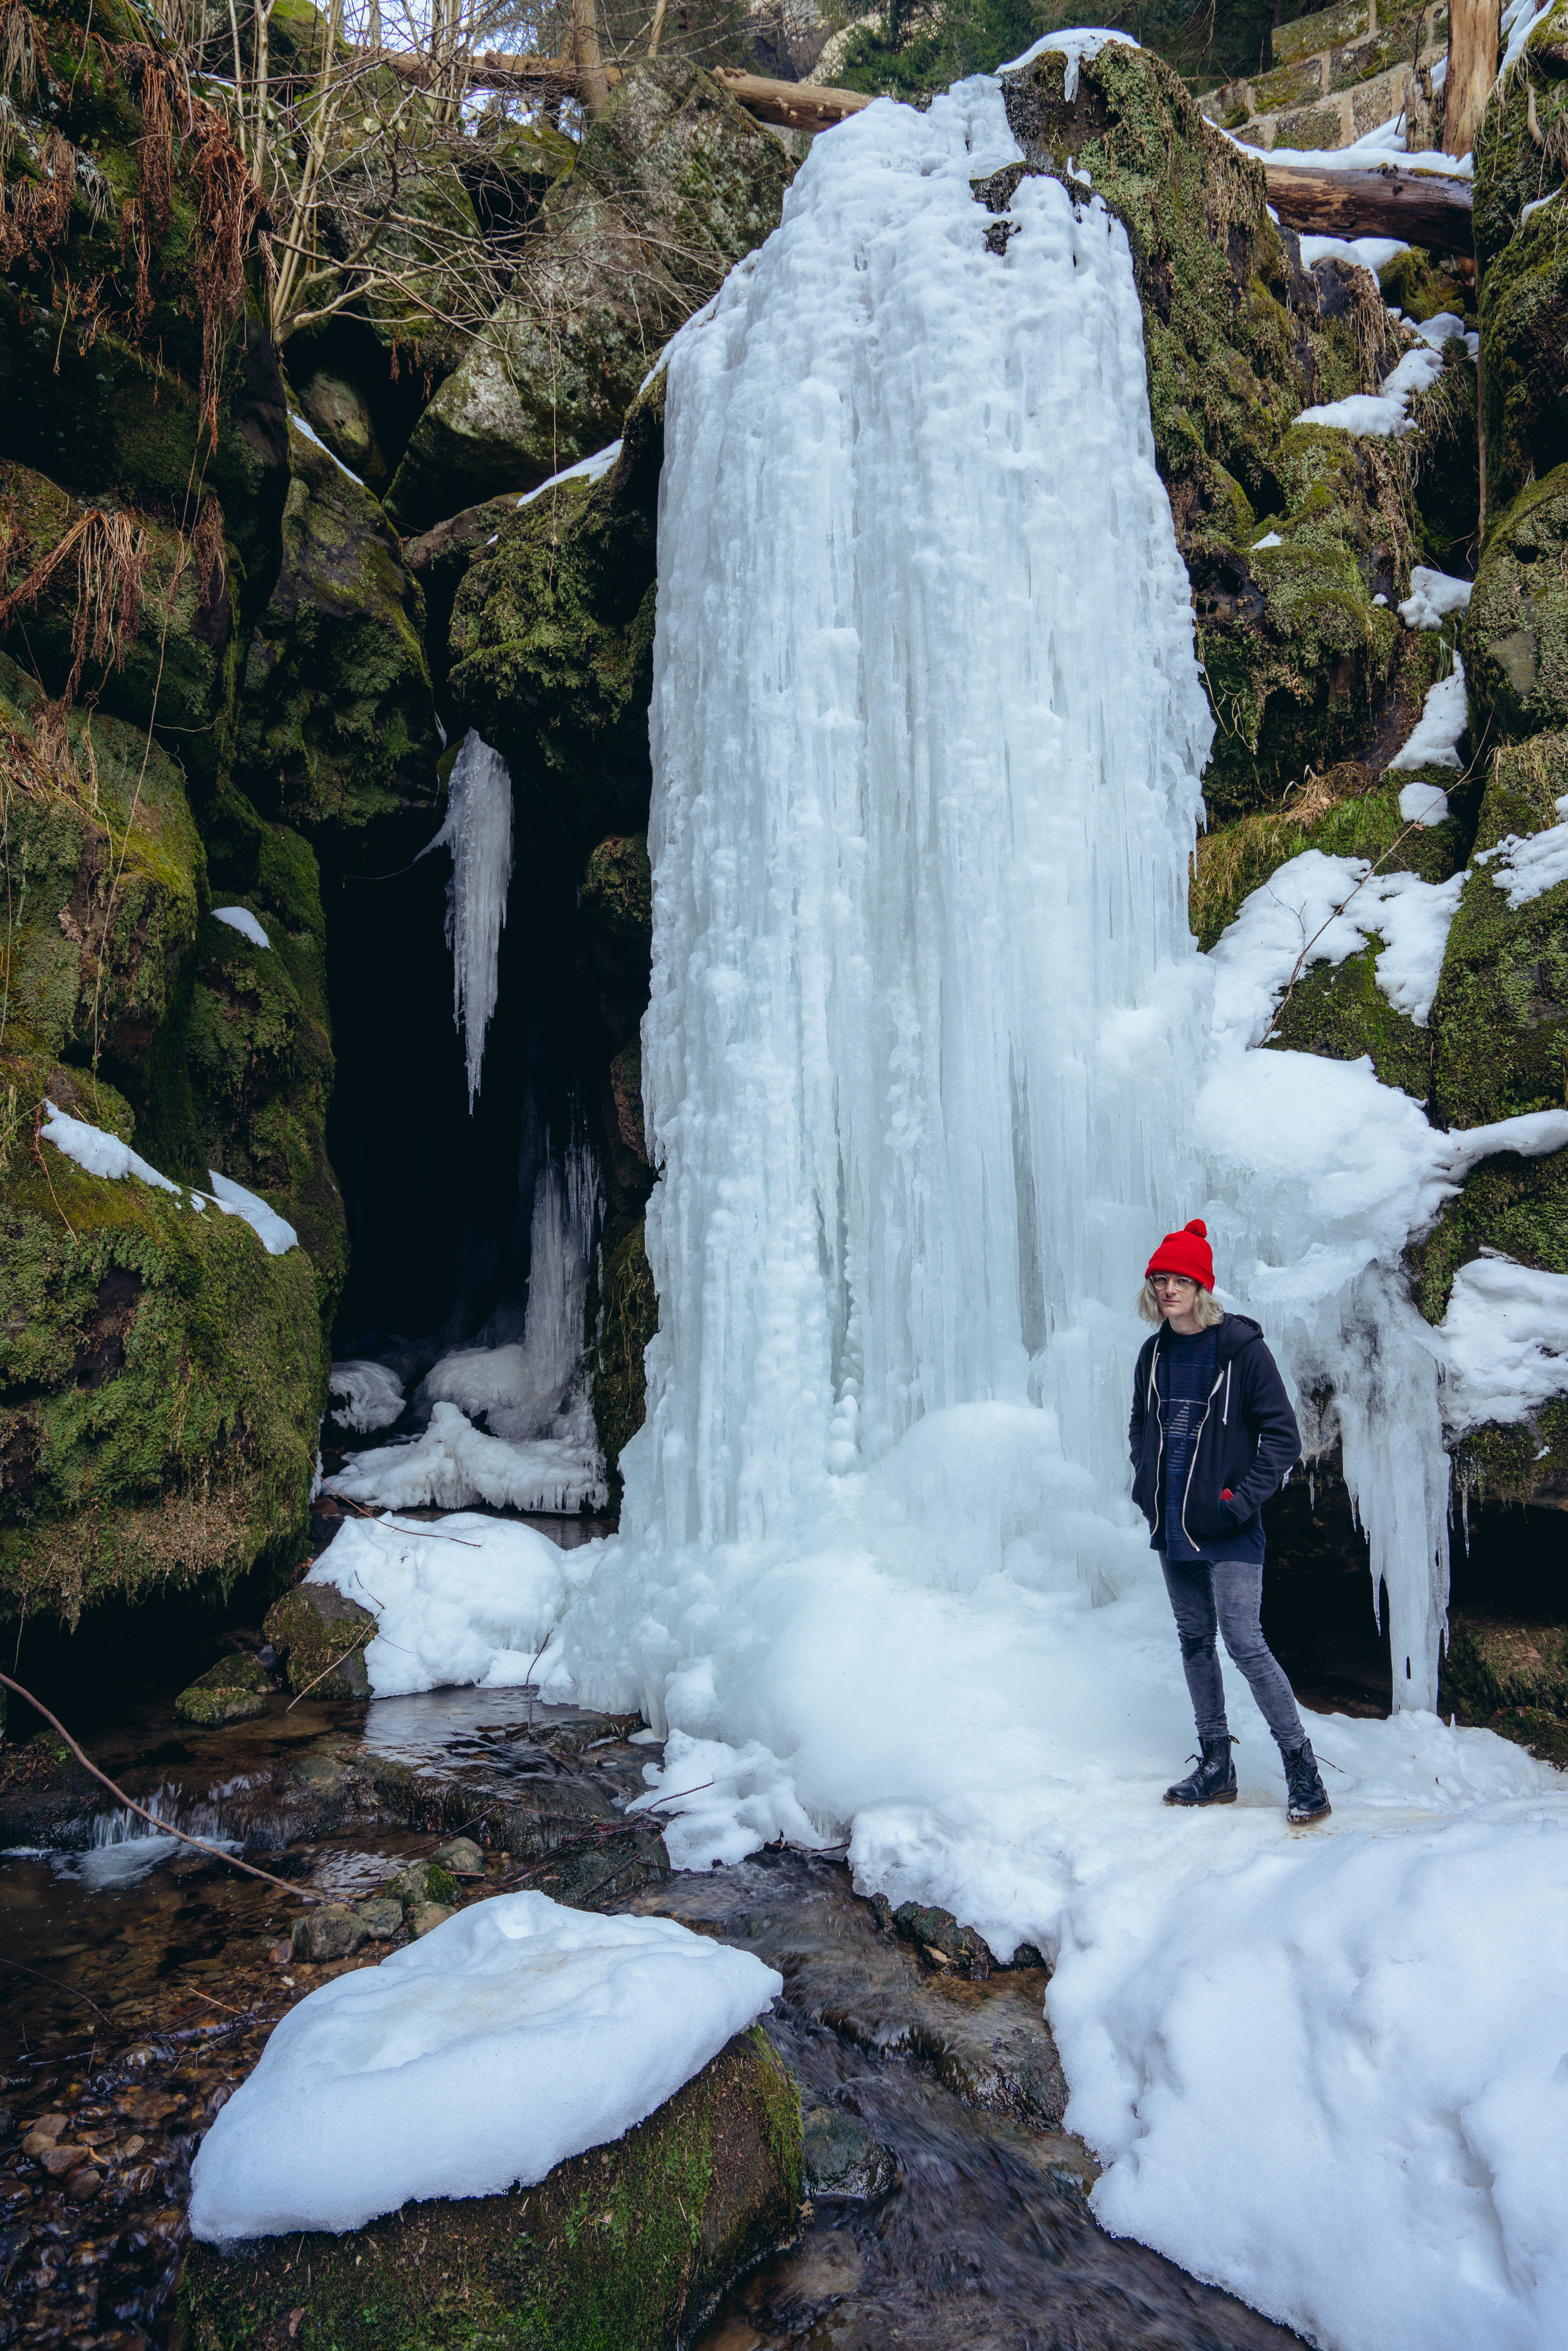 Standing next to a frozen waterfall in Saxon Switzerland